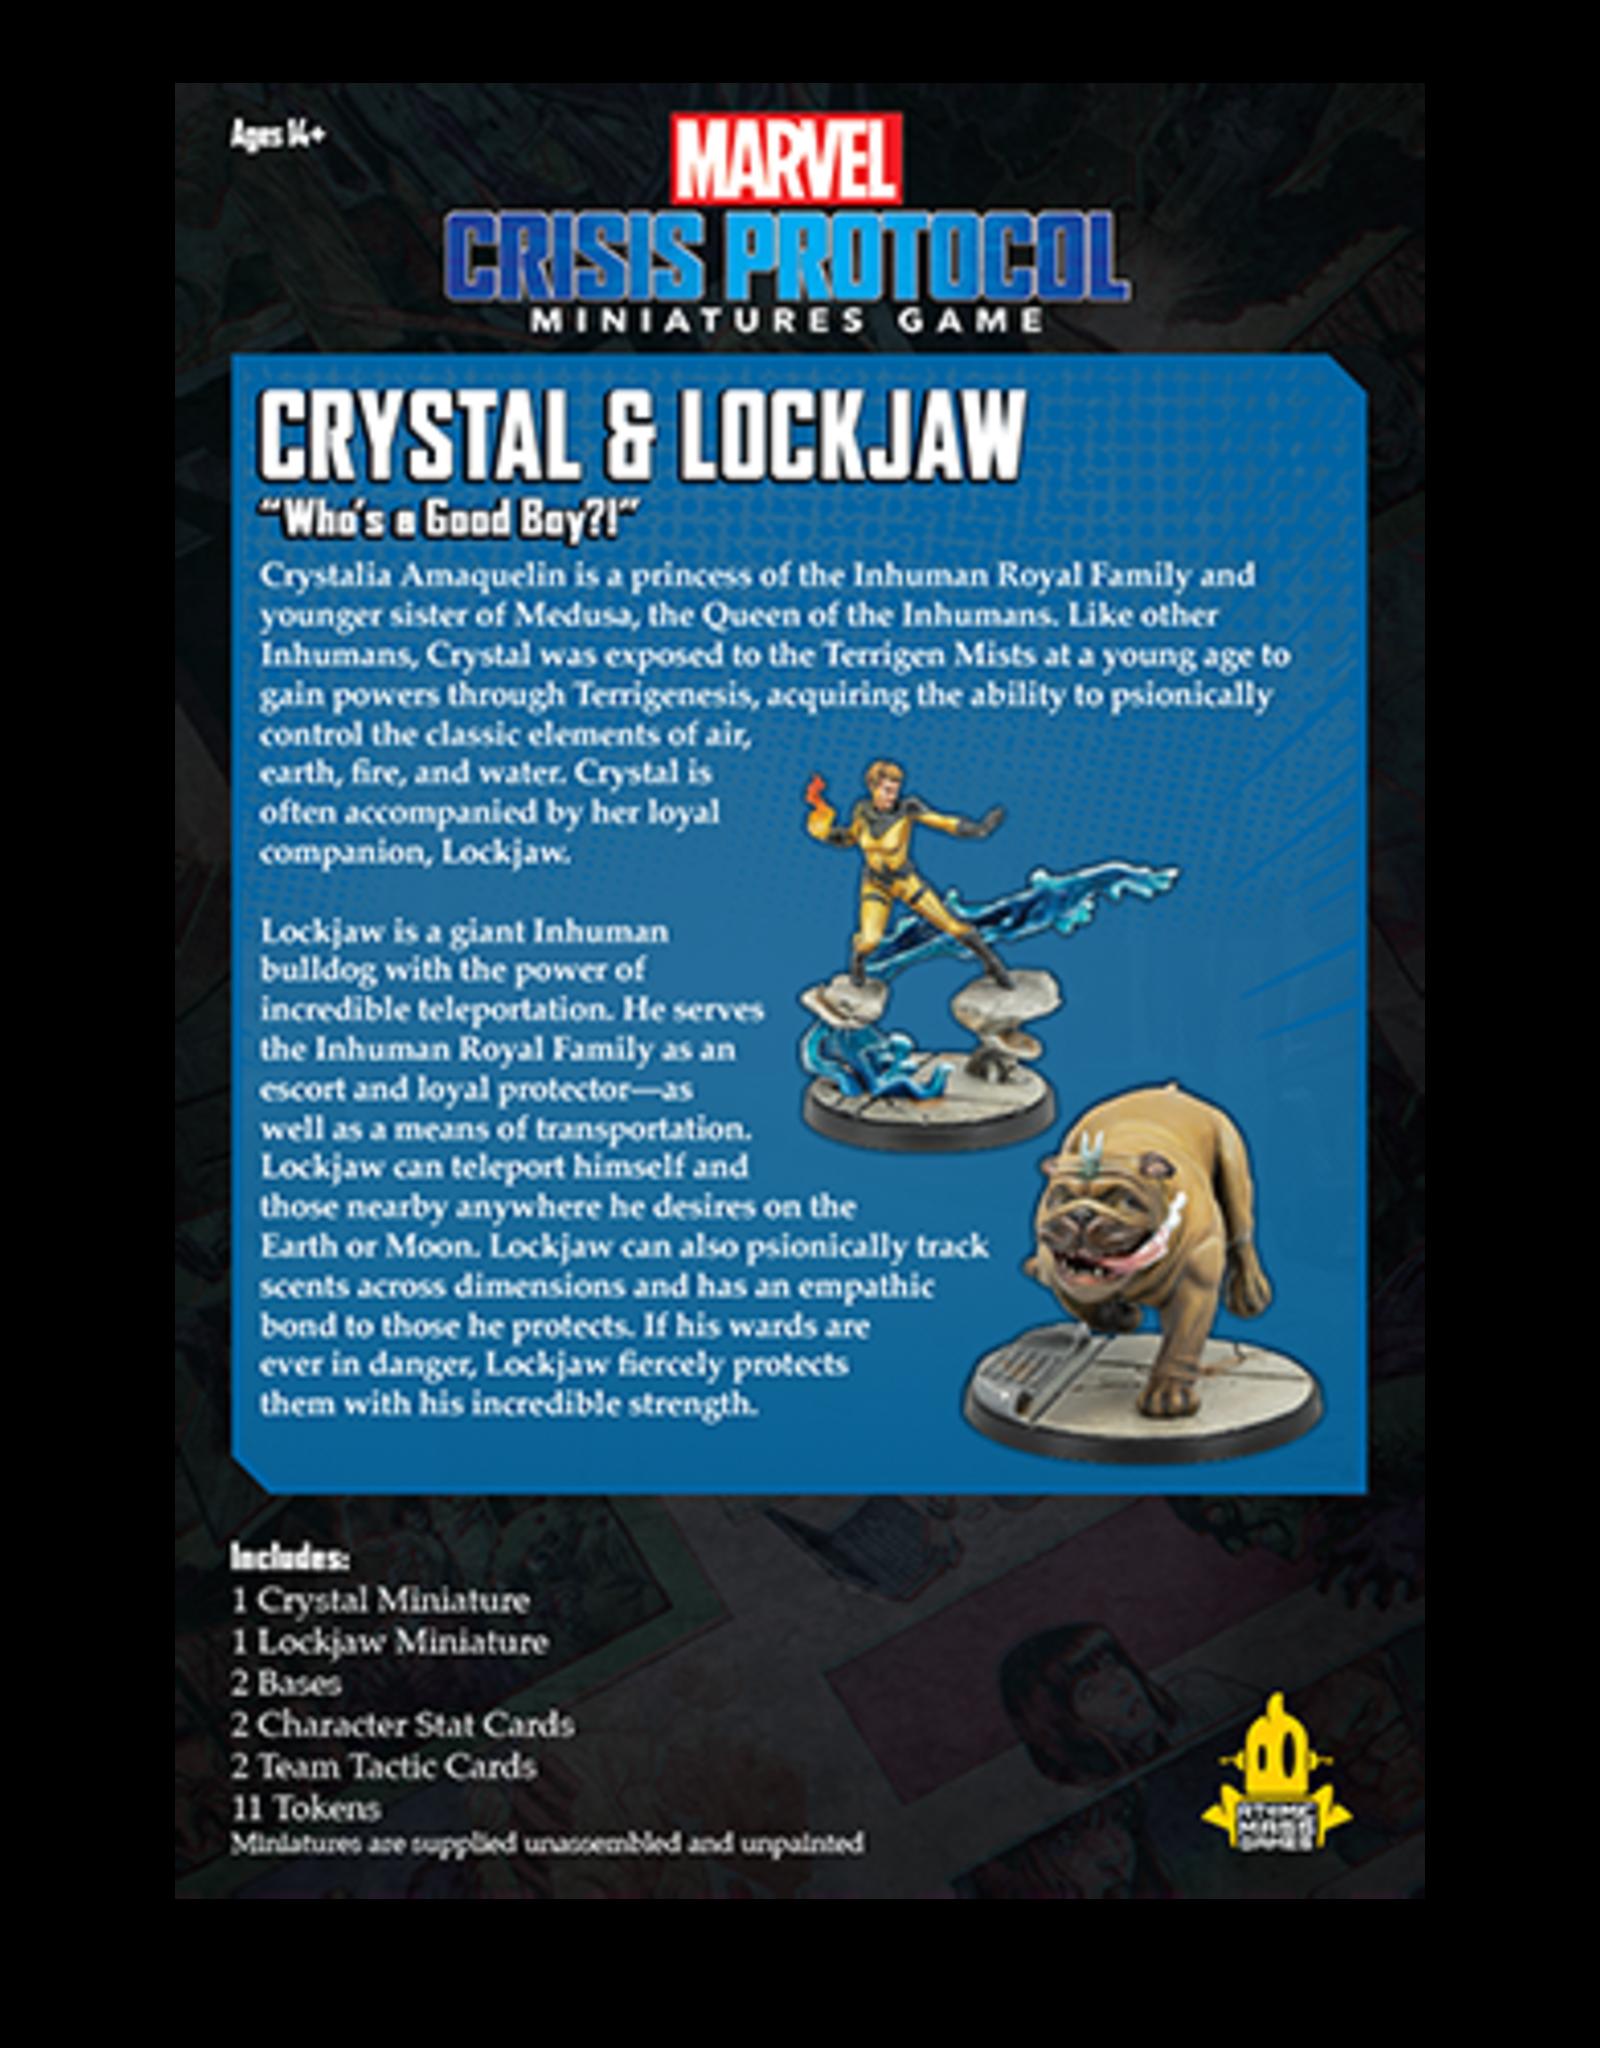 Atomic Mass Marvel Crisis Protocol: Crystal and Lockjaw